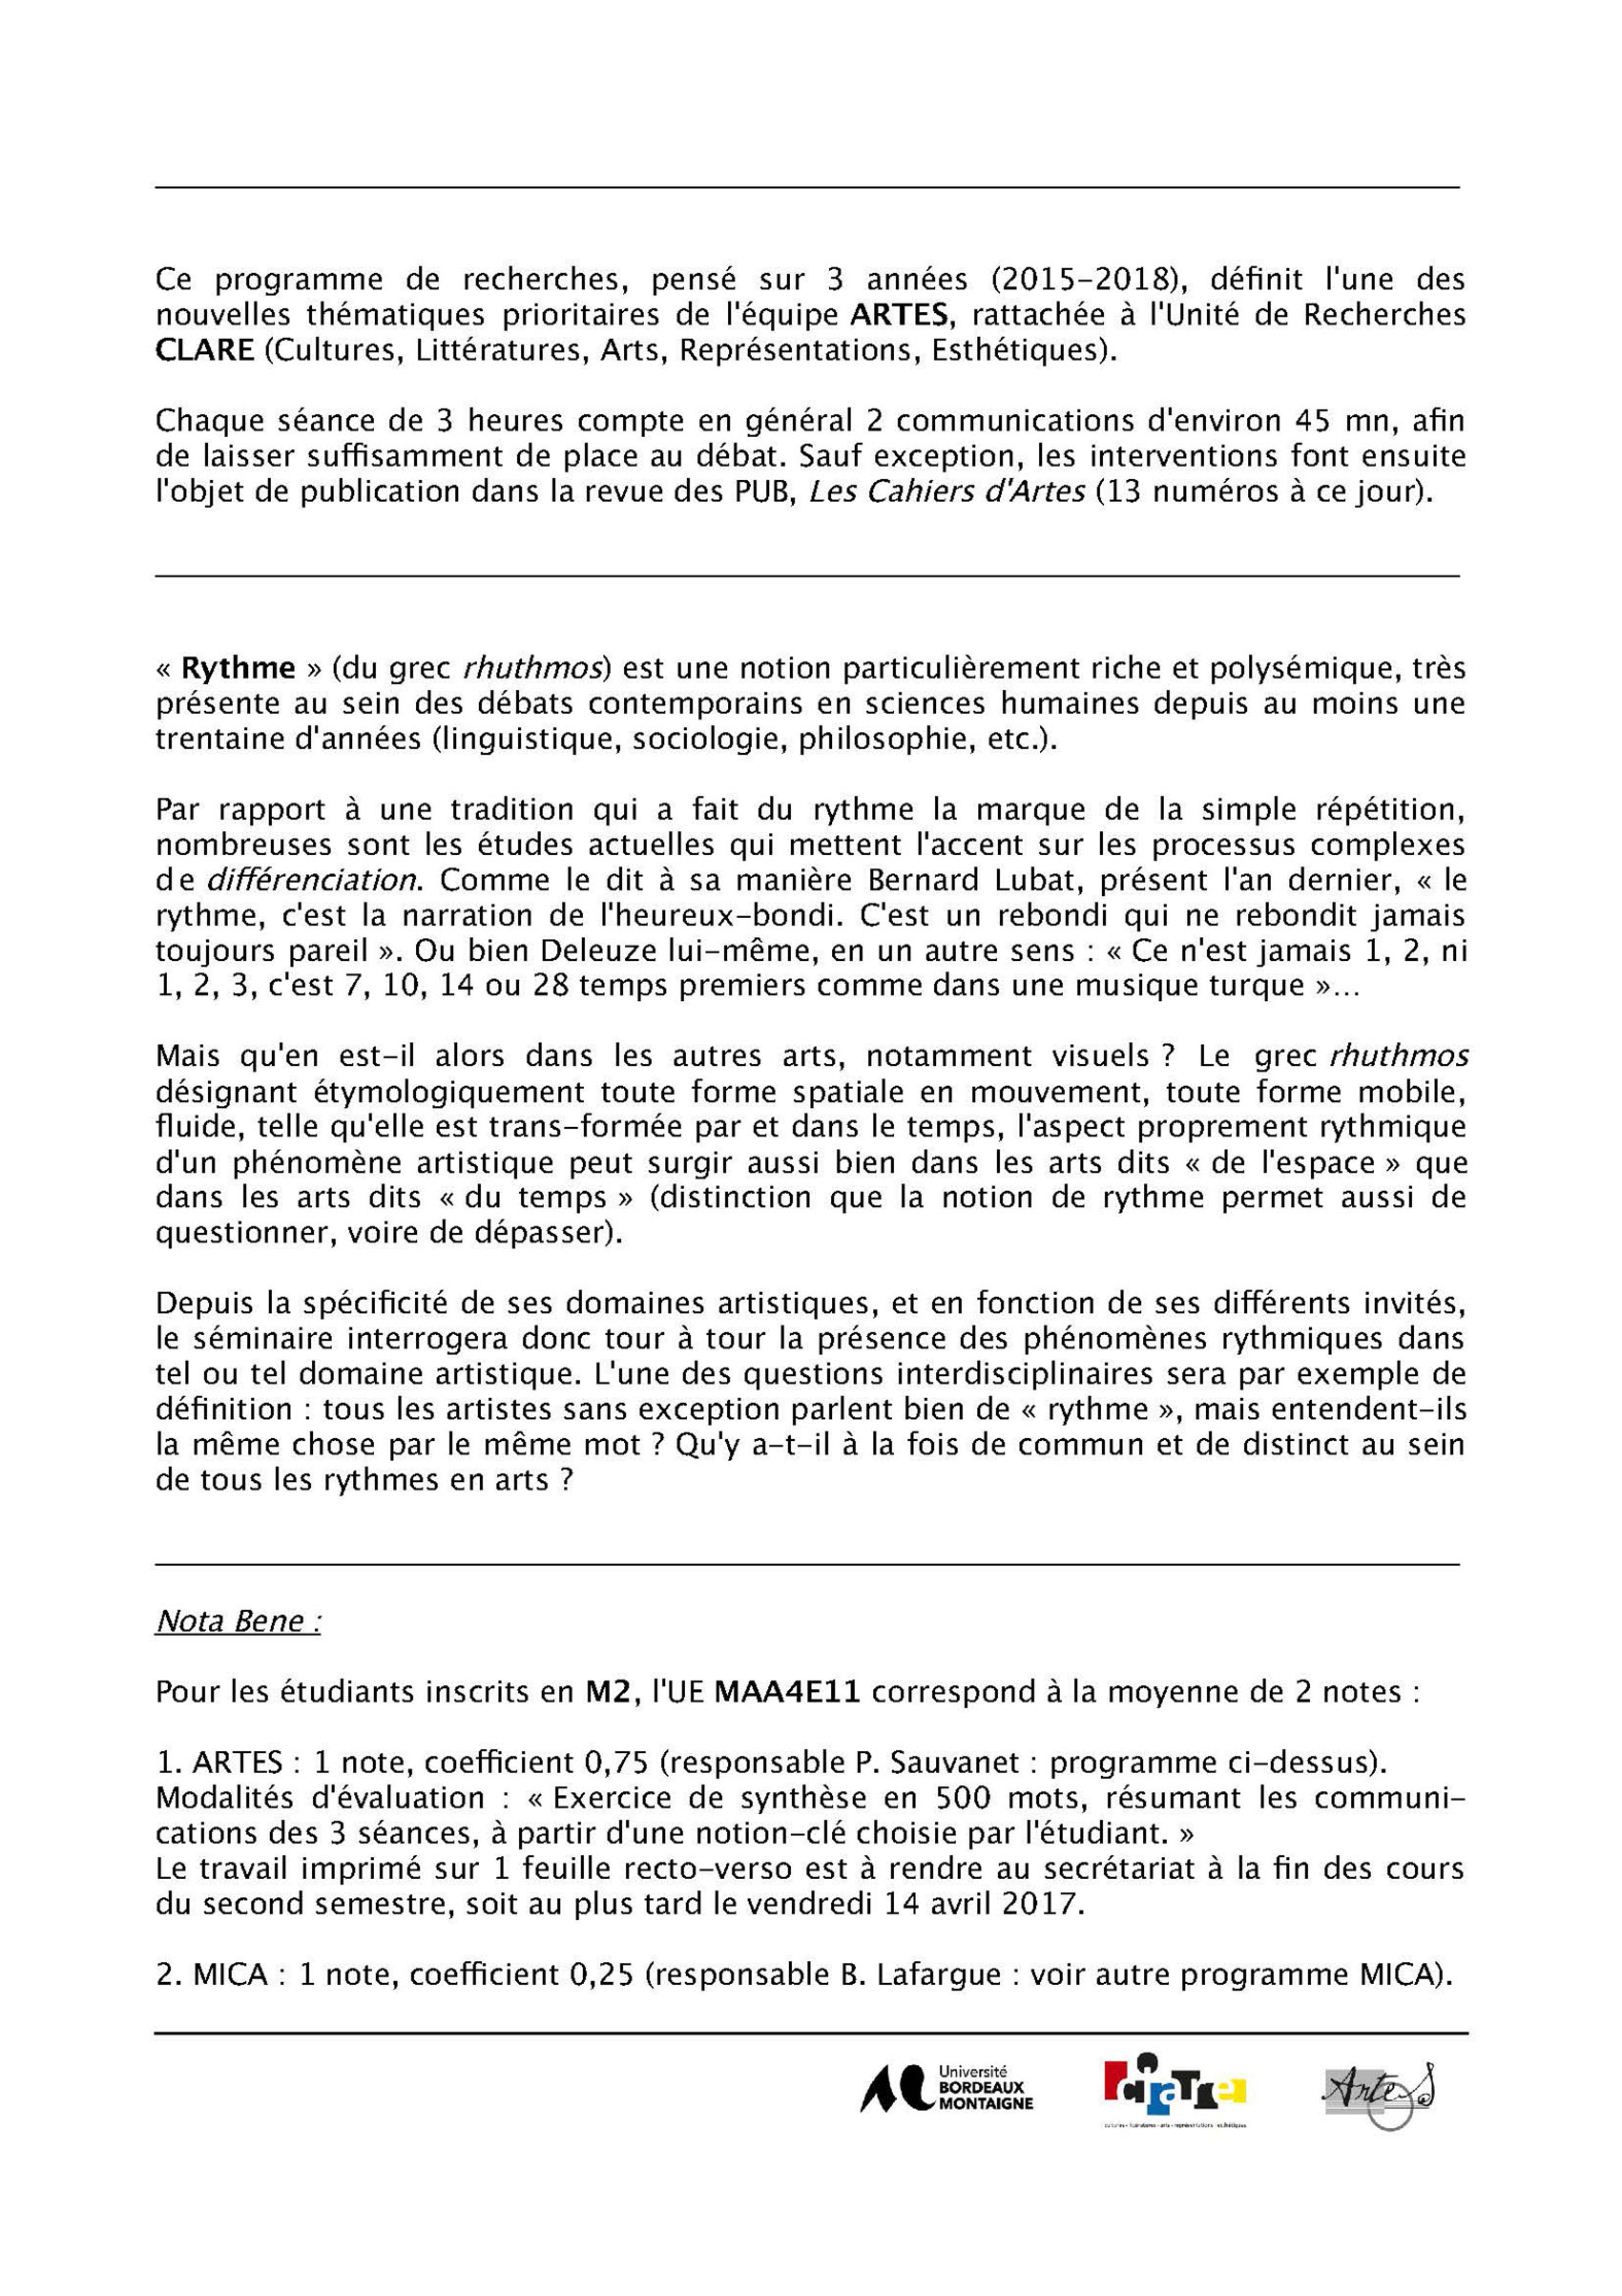 seminaire-artes-rythmes-2017_page_2